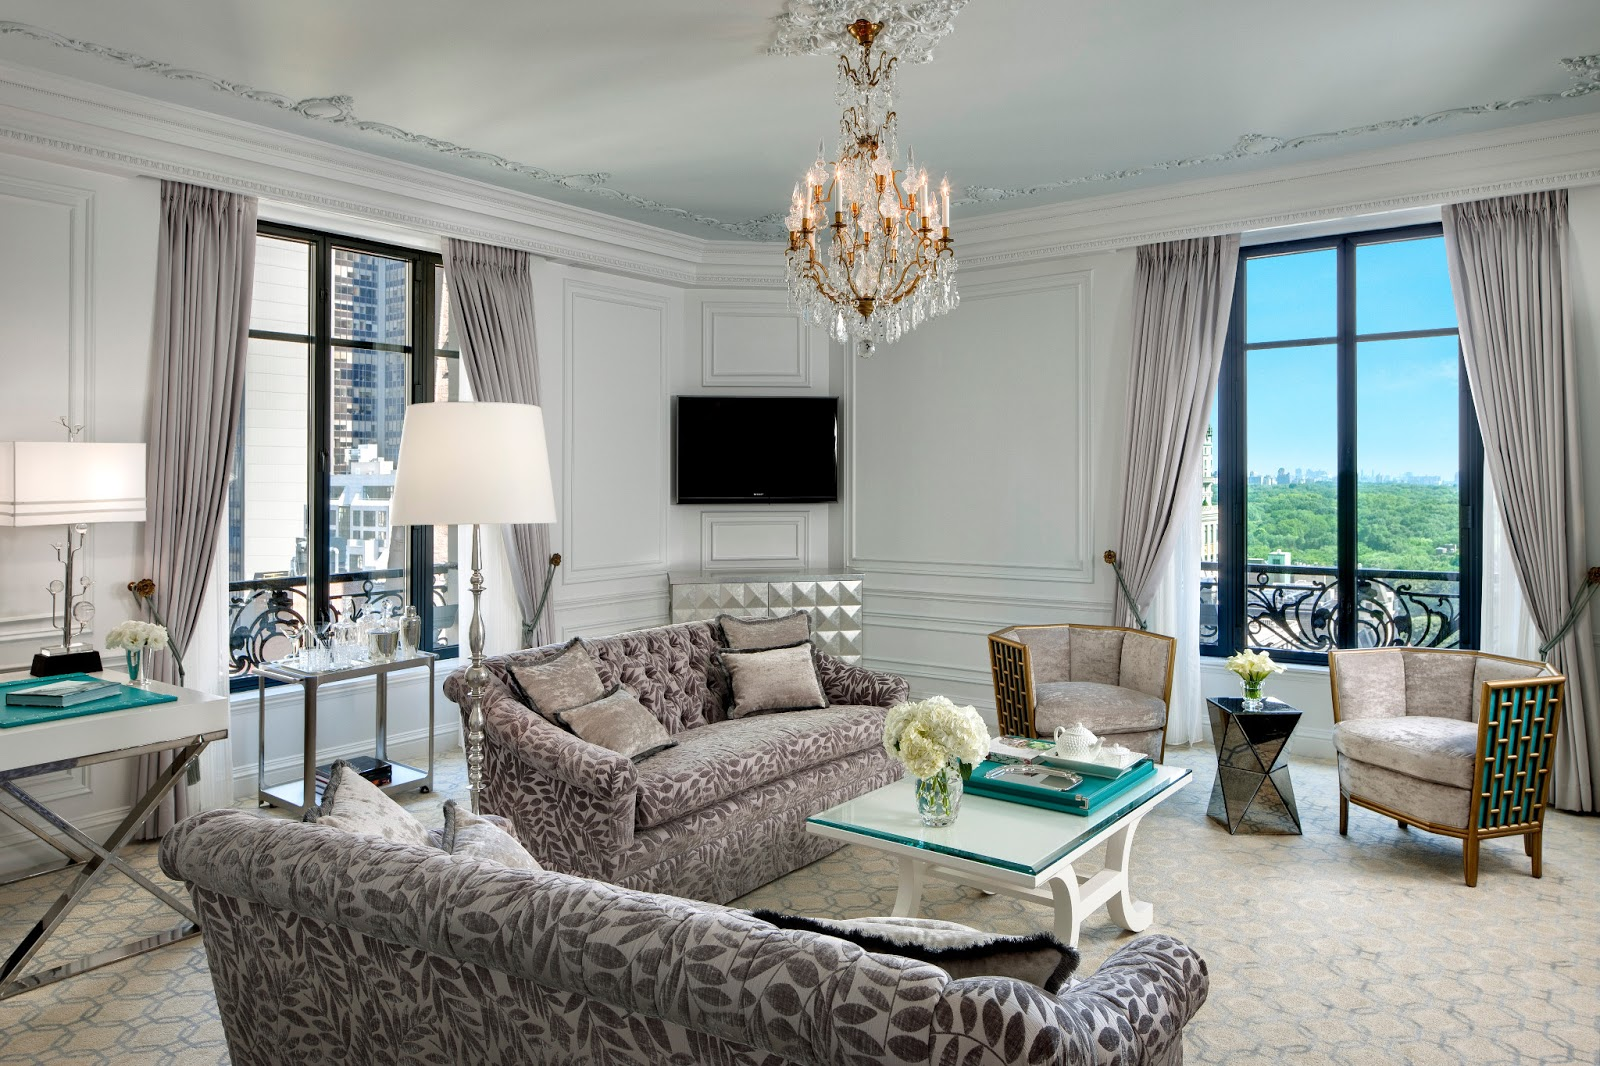 Modern classic jak urz dzi salon z telewizorem - Blue and silver living room designs ...